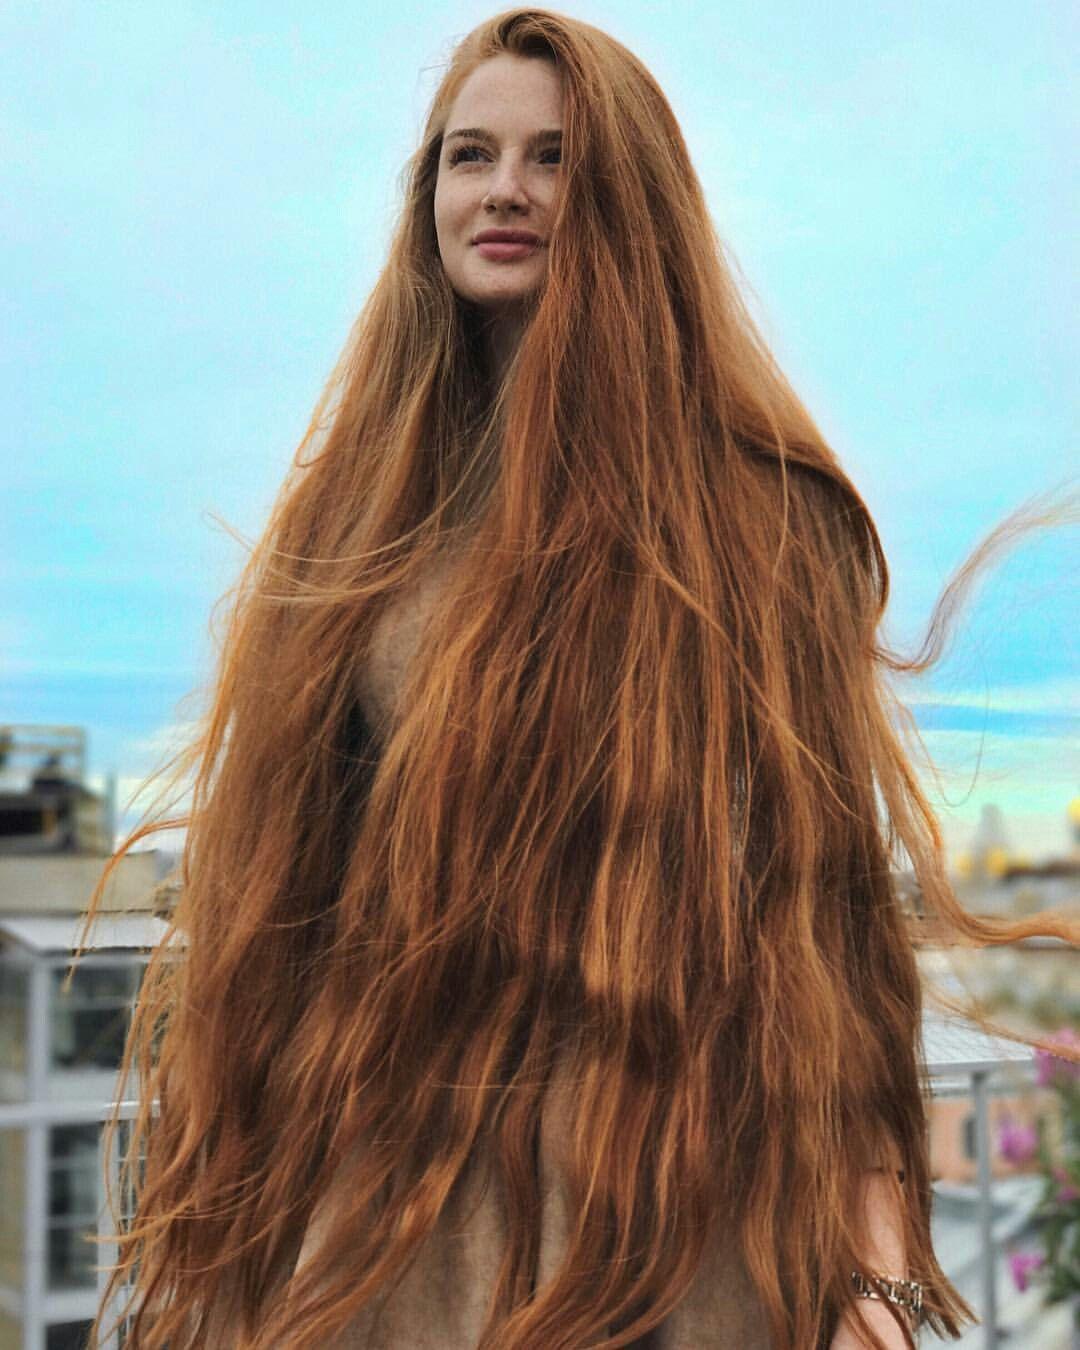 pindivine light on beauty  long hair styles hair